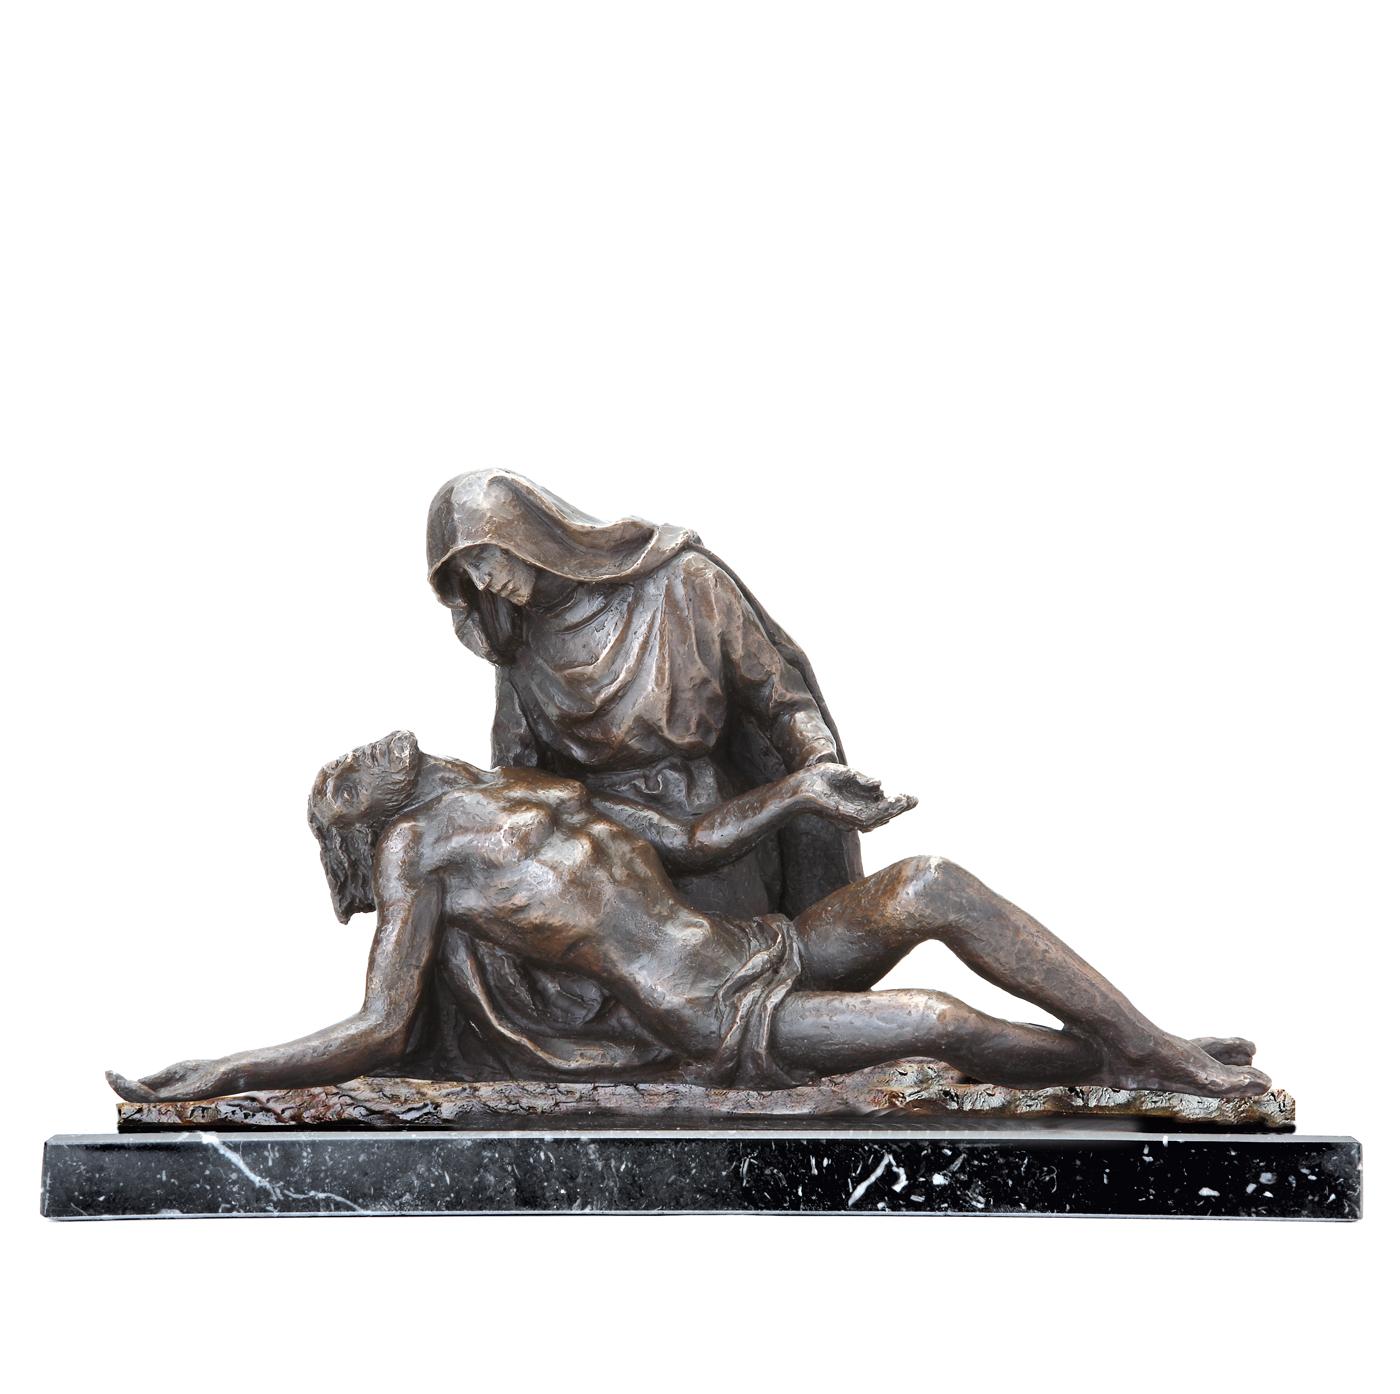 Escultura La Piedad escultura historica Madrid